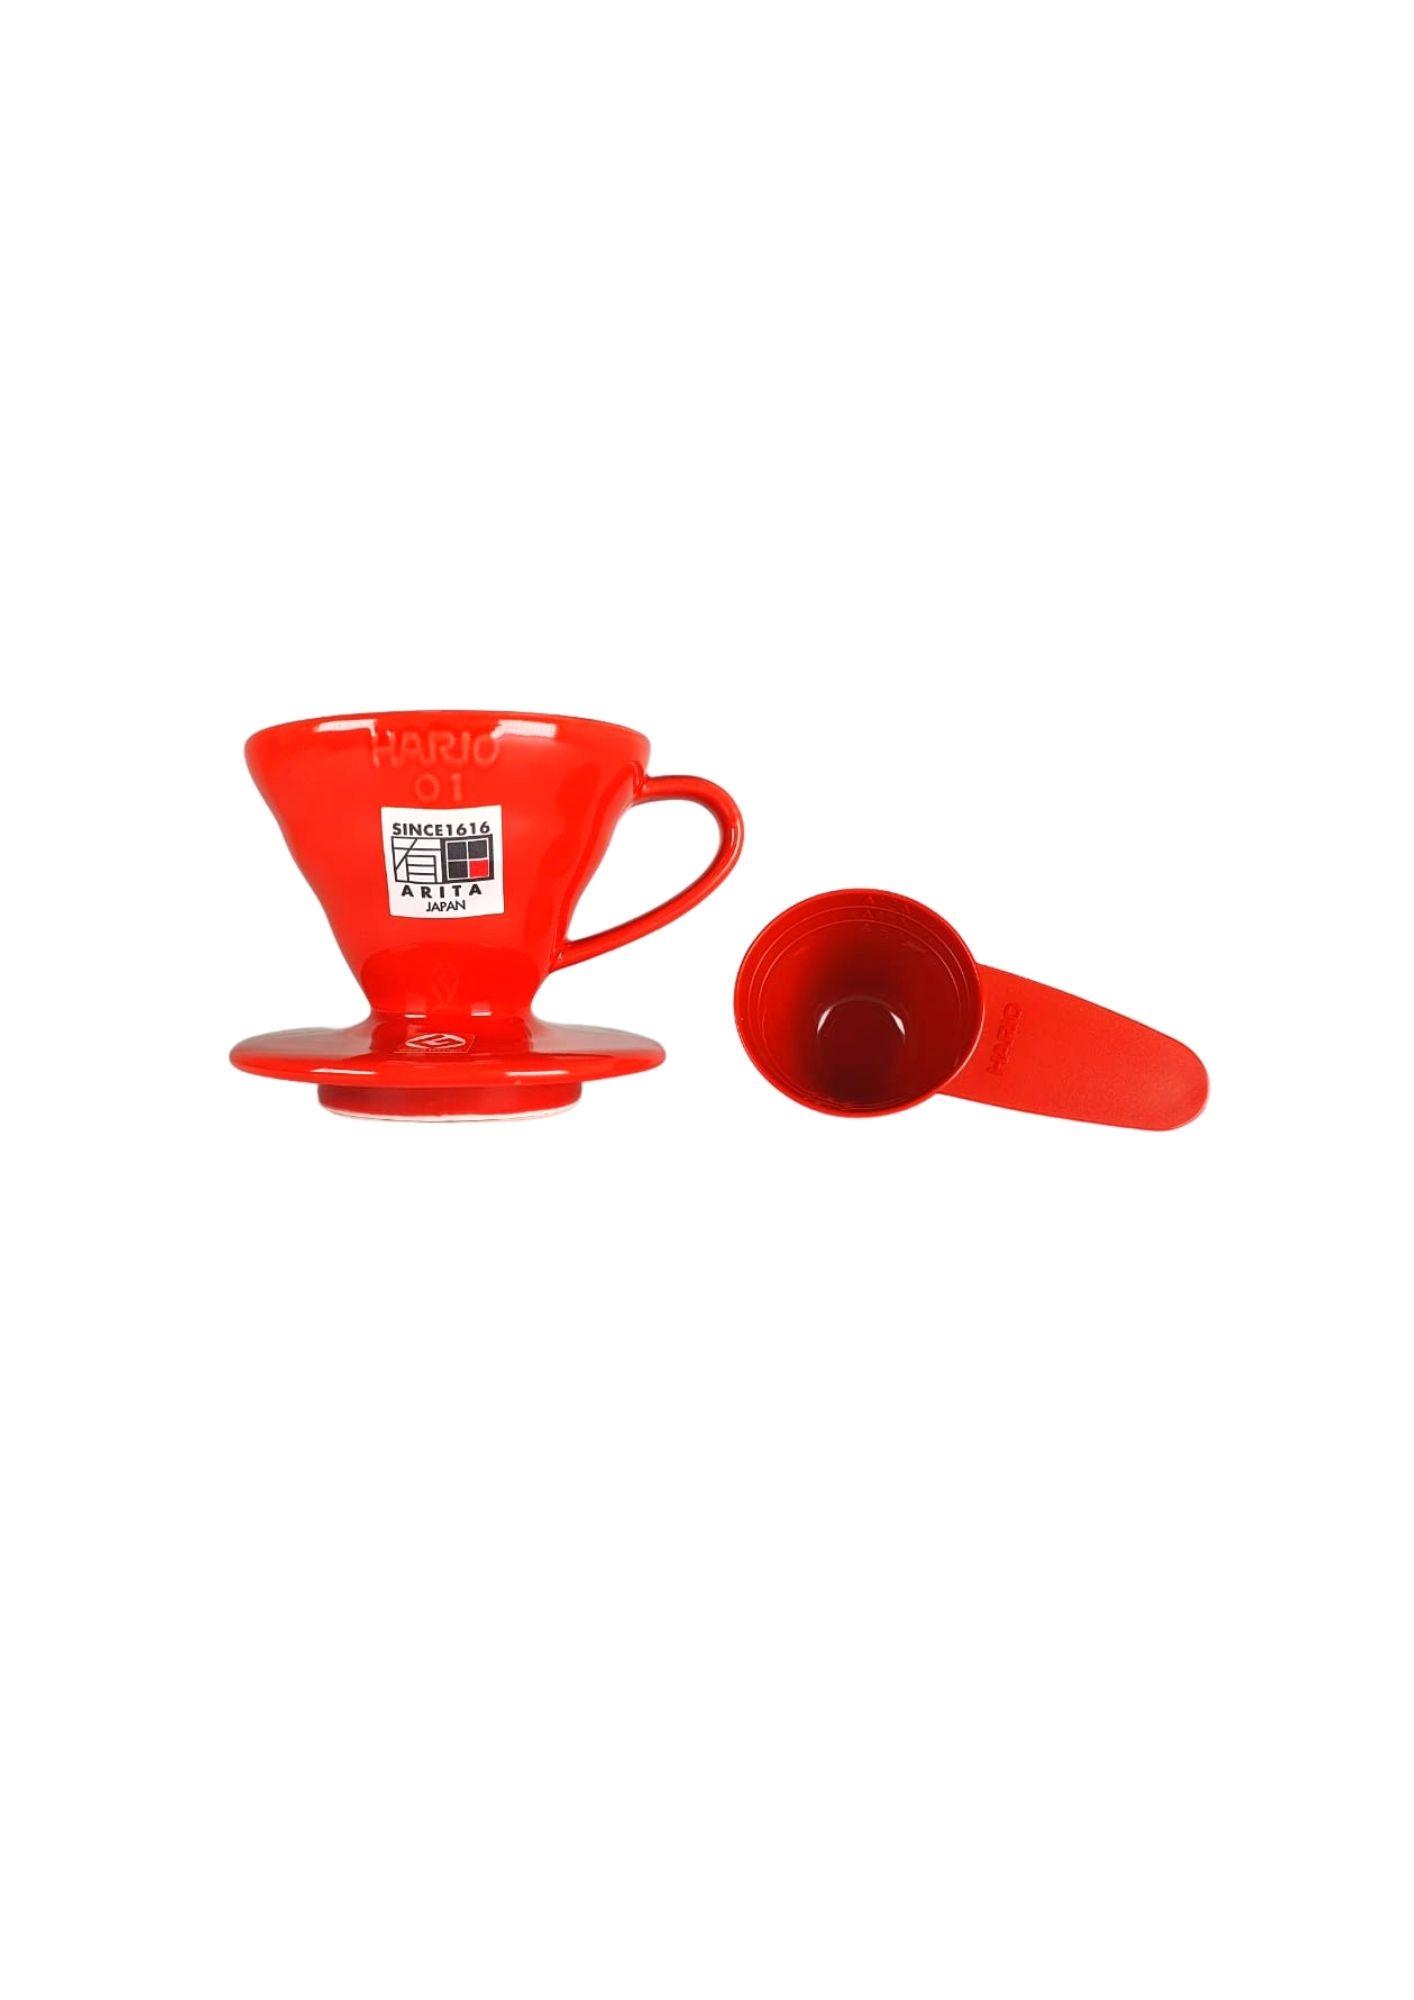 HARIO COADOR DE CAFE V60 01 VDC-01 RED